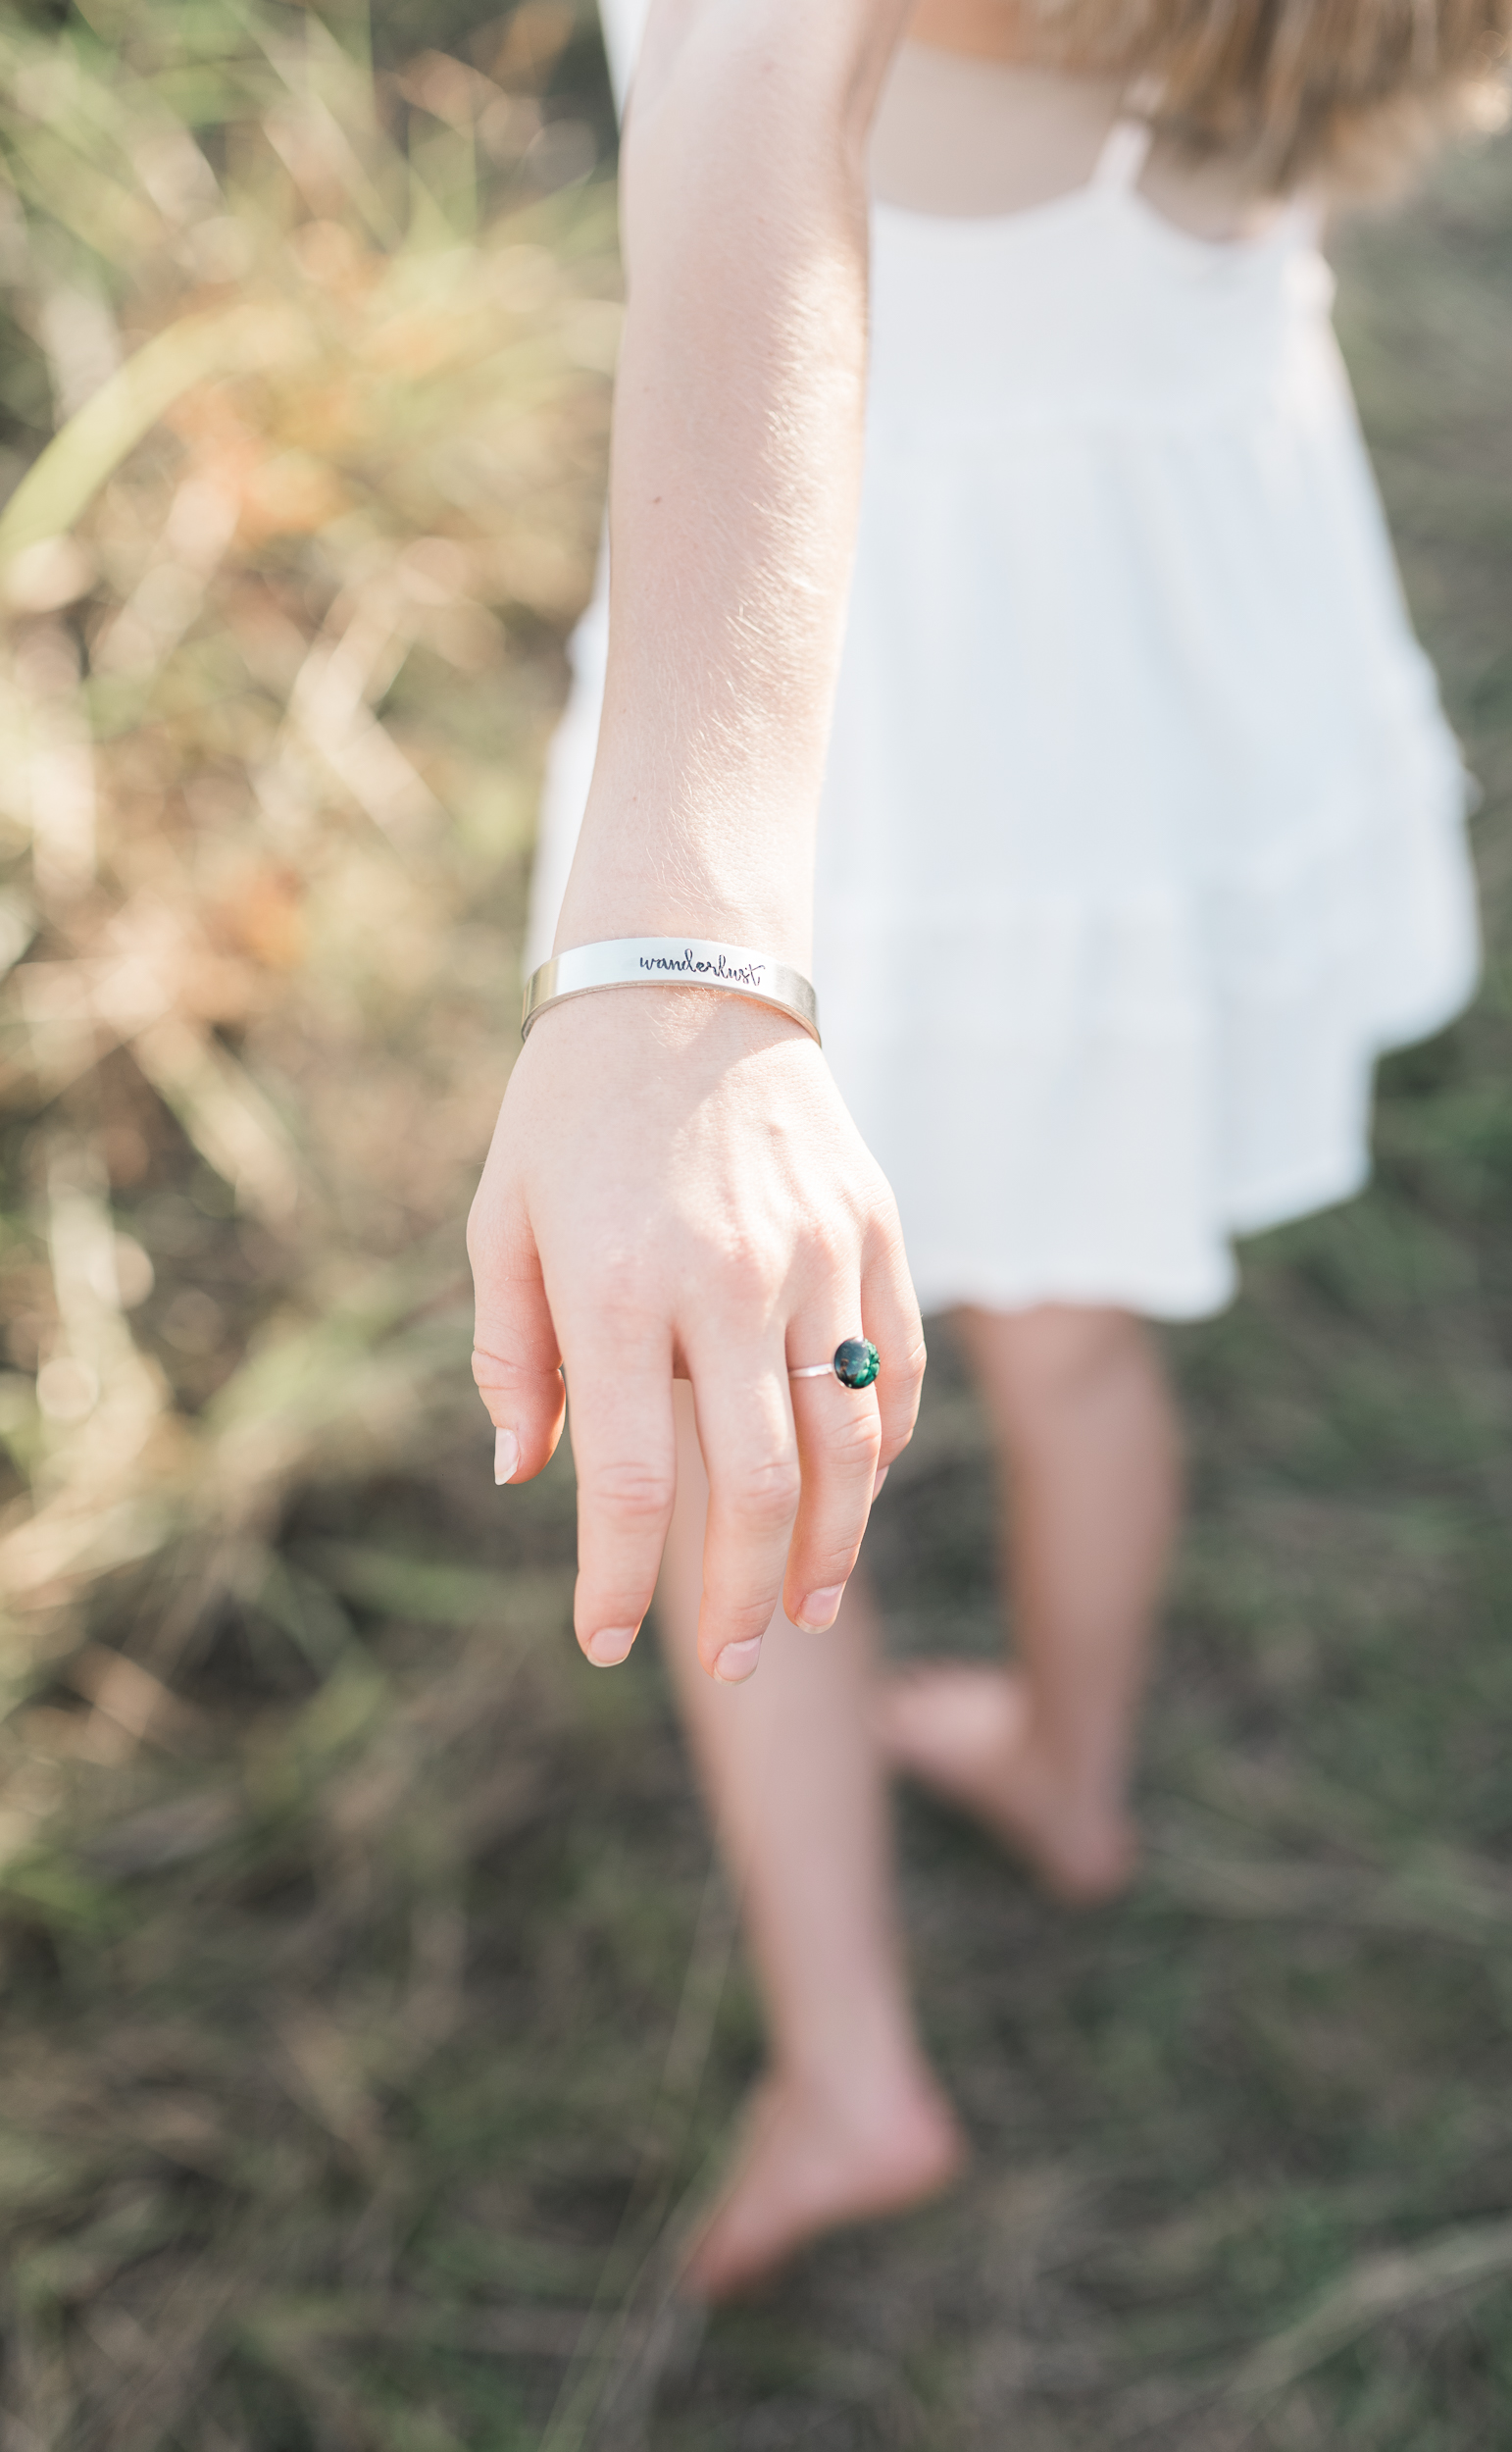 jewelry-branding-photography-guam-roxanne-augusta-12.jpg